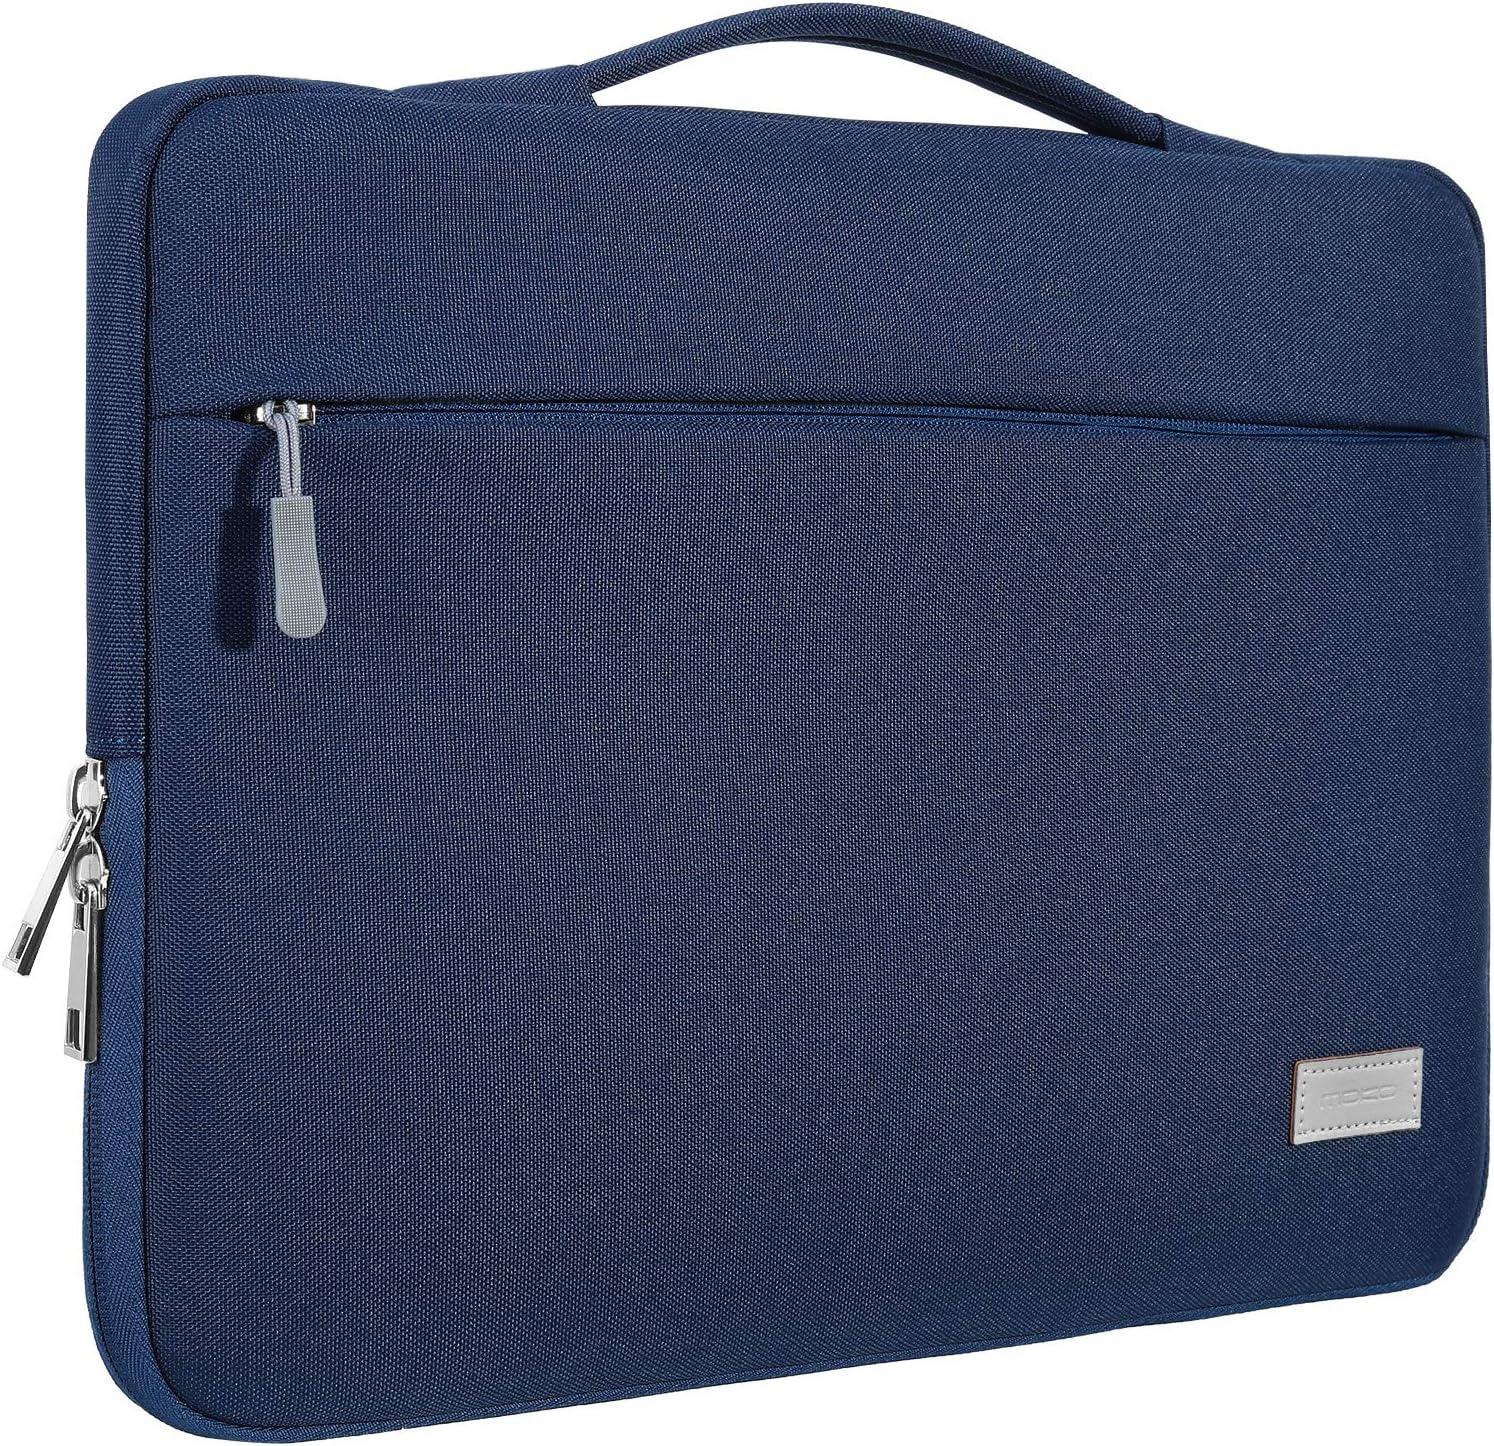 MoKo 13-13.3 Inch Laptop Sleeve Case Fit with MacBook Air 13-inch Retina, MacBook Pro 13